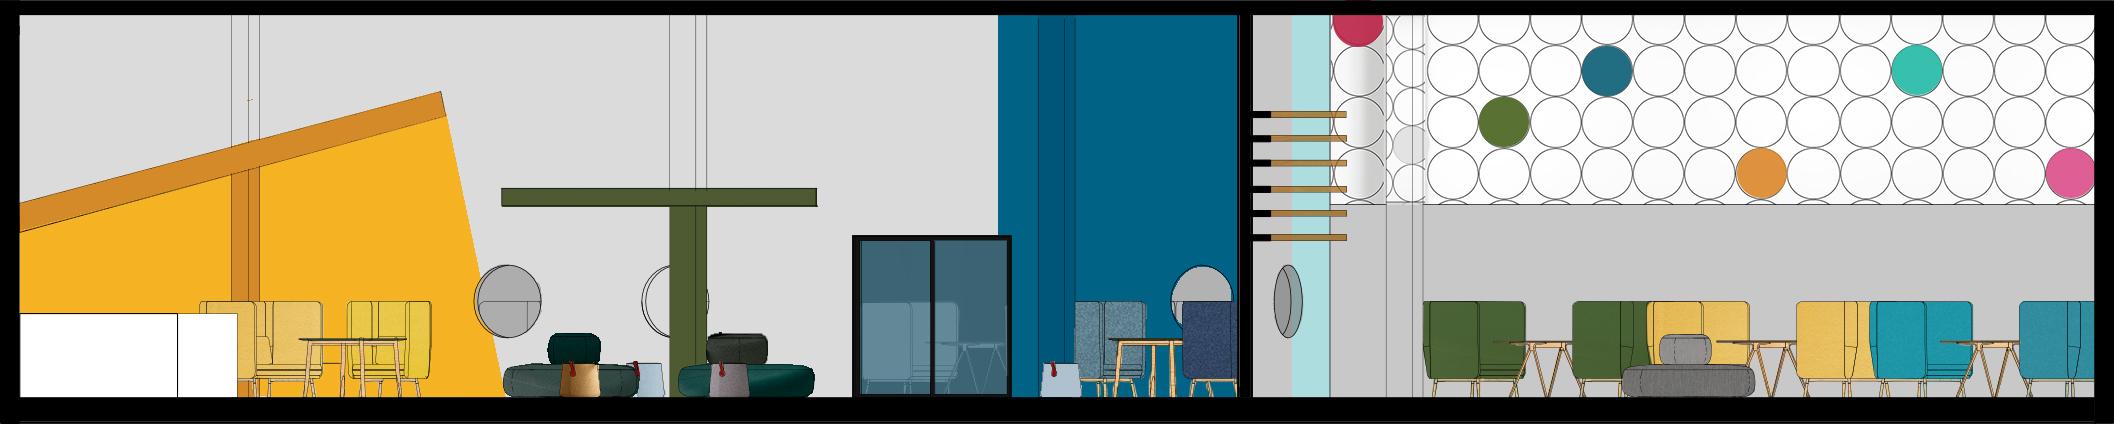 section-5-rendered.jpg